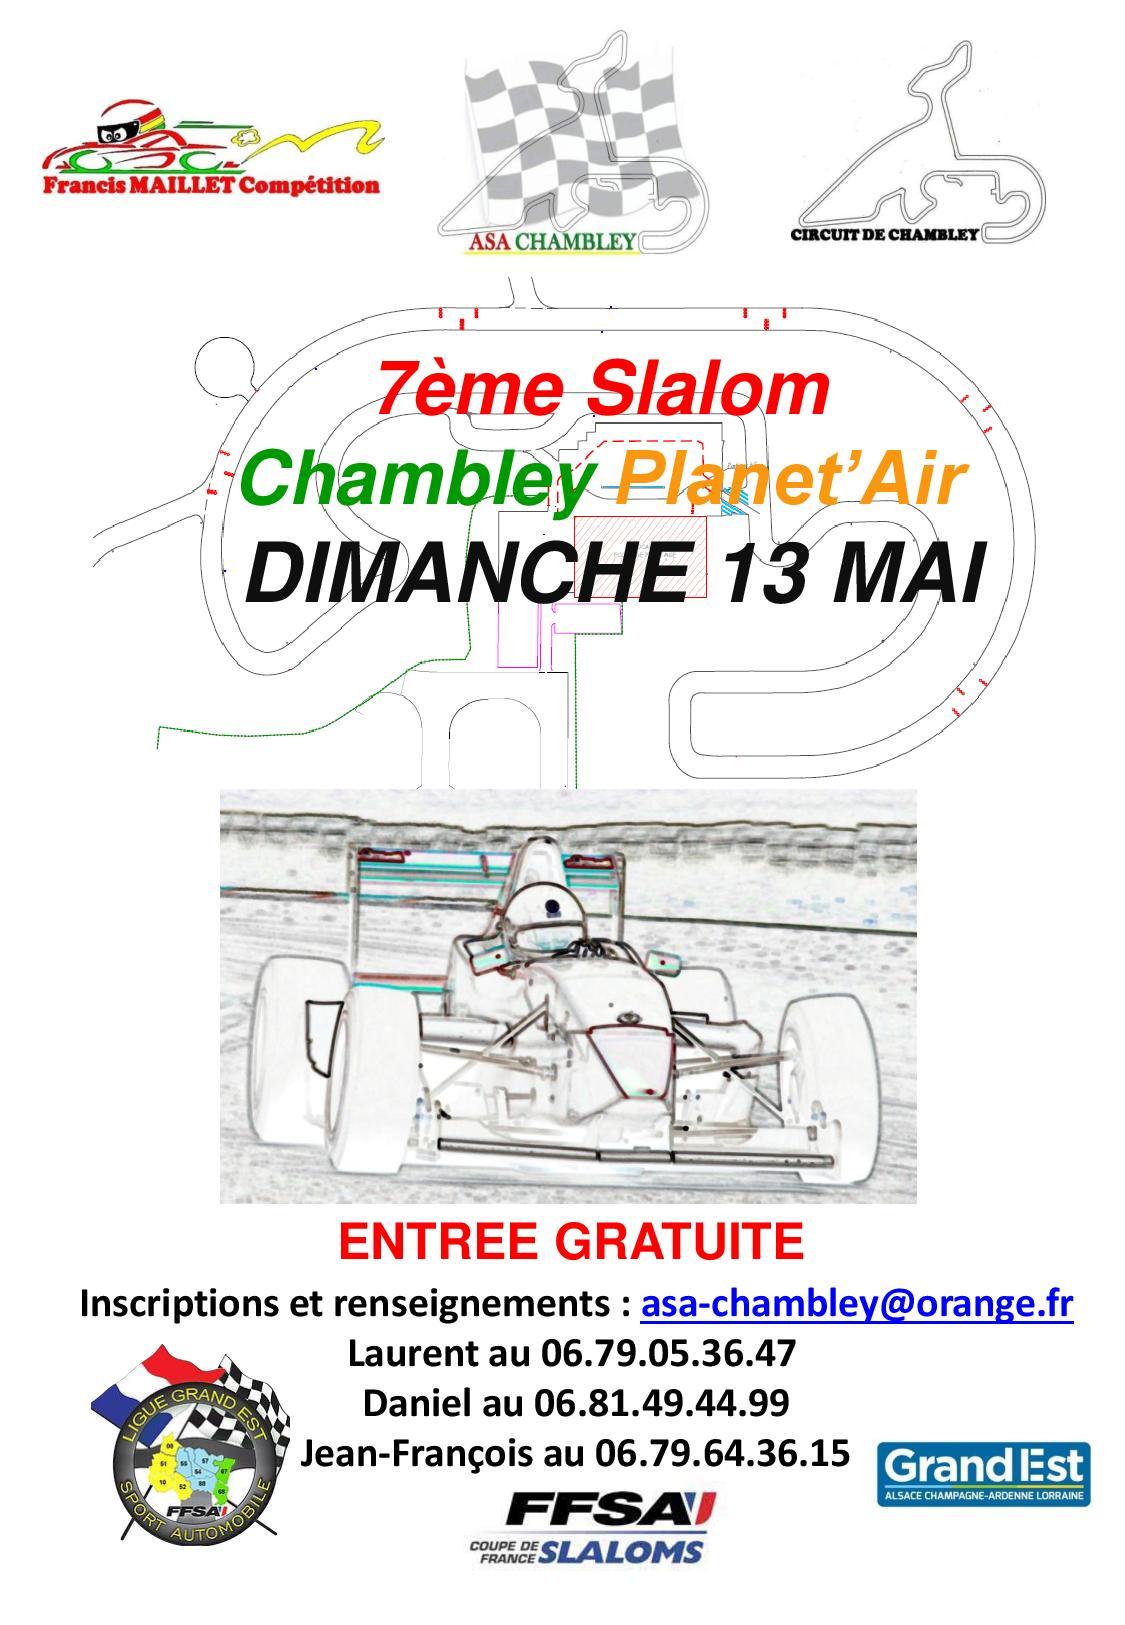 Slalom de Chambley 2021 (54) | RALLYEGO.com